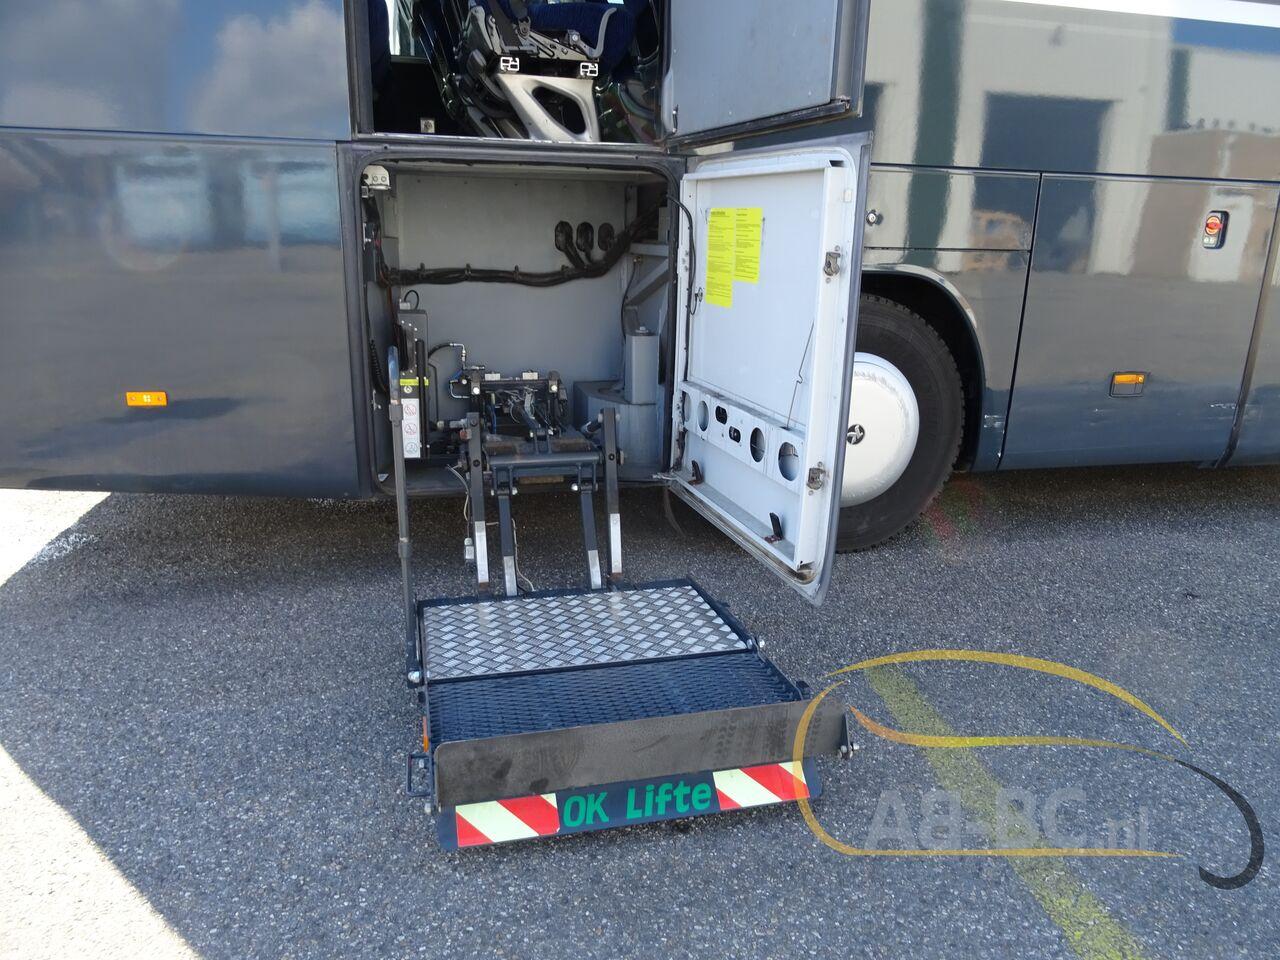 coach-busSETRA-S415-GT-HD-FINAL-EDITION---1620382171245618671_big_fe732fd62d626cae239298f313b8ee84--21050713010665719300